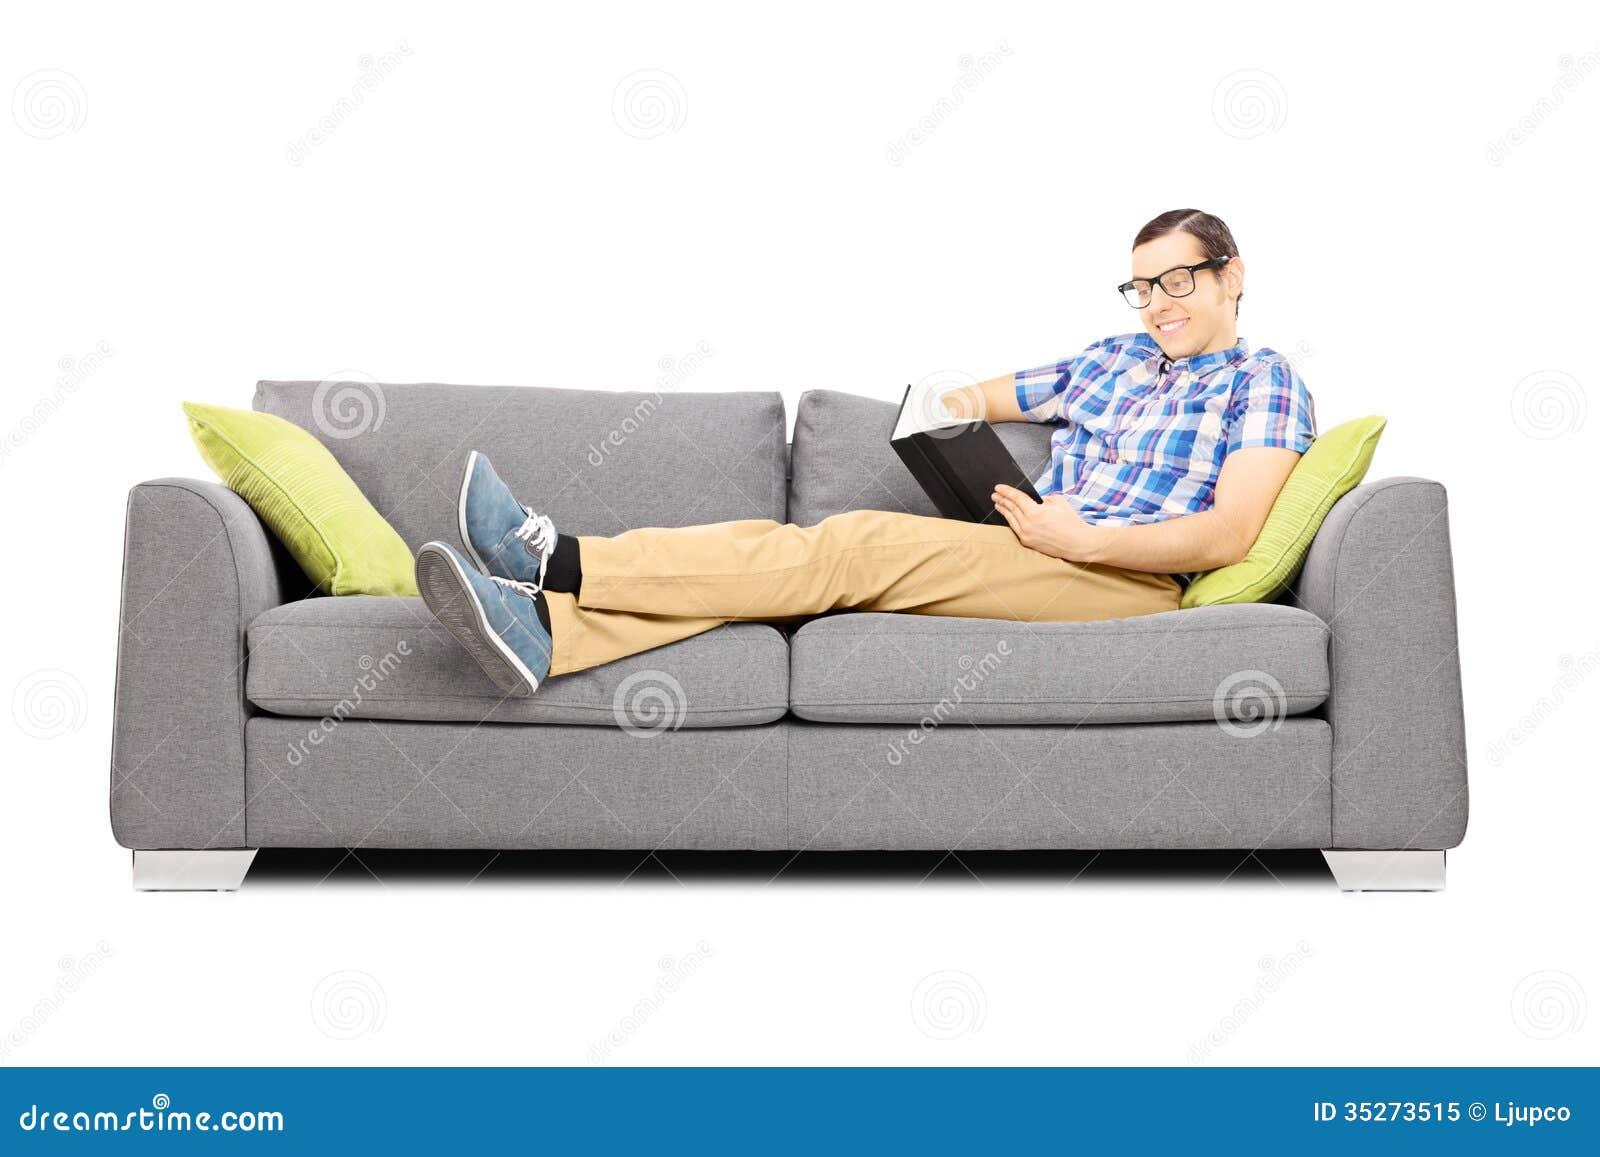 Novel Furniture Review